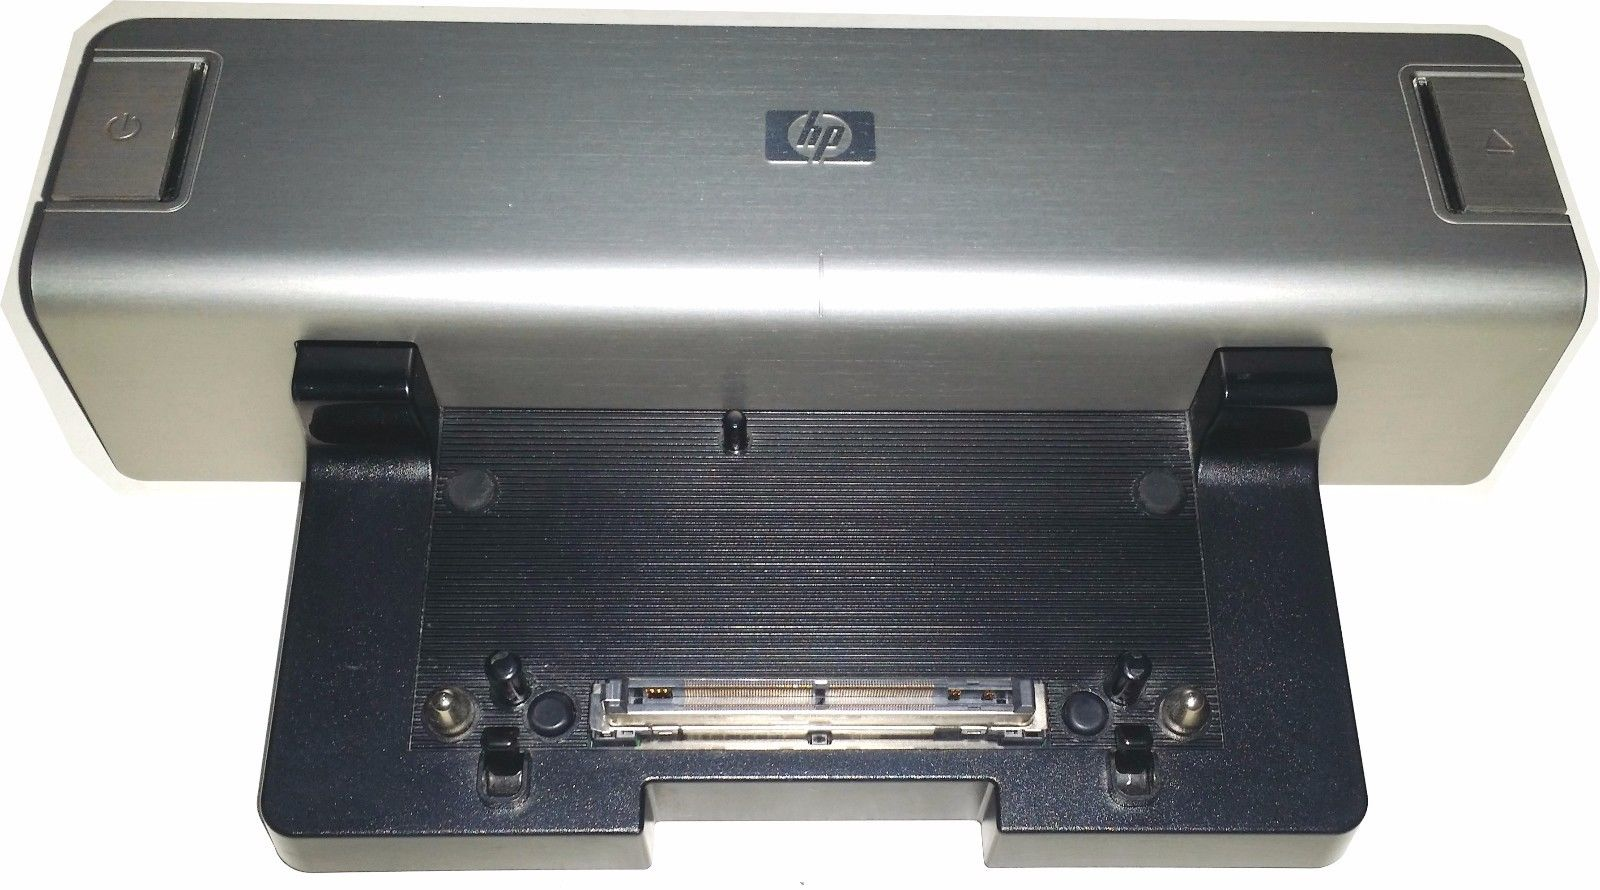 HP Compaq 6710b Notebook Universal PostScript Print Driver